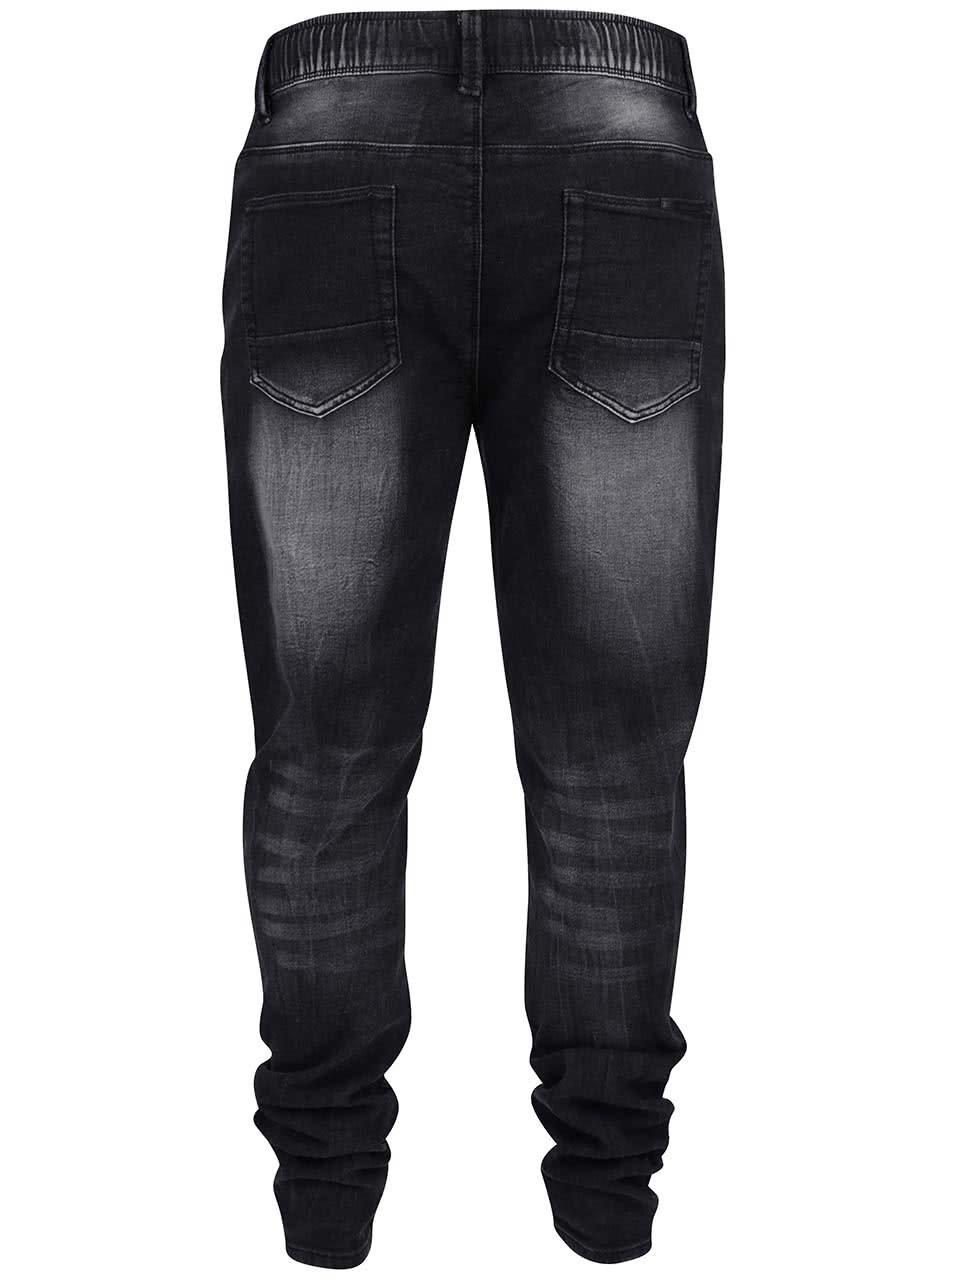 Šedo-černé pánské džíny Shine Original ... ac2df986d5